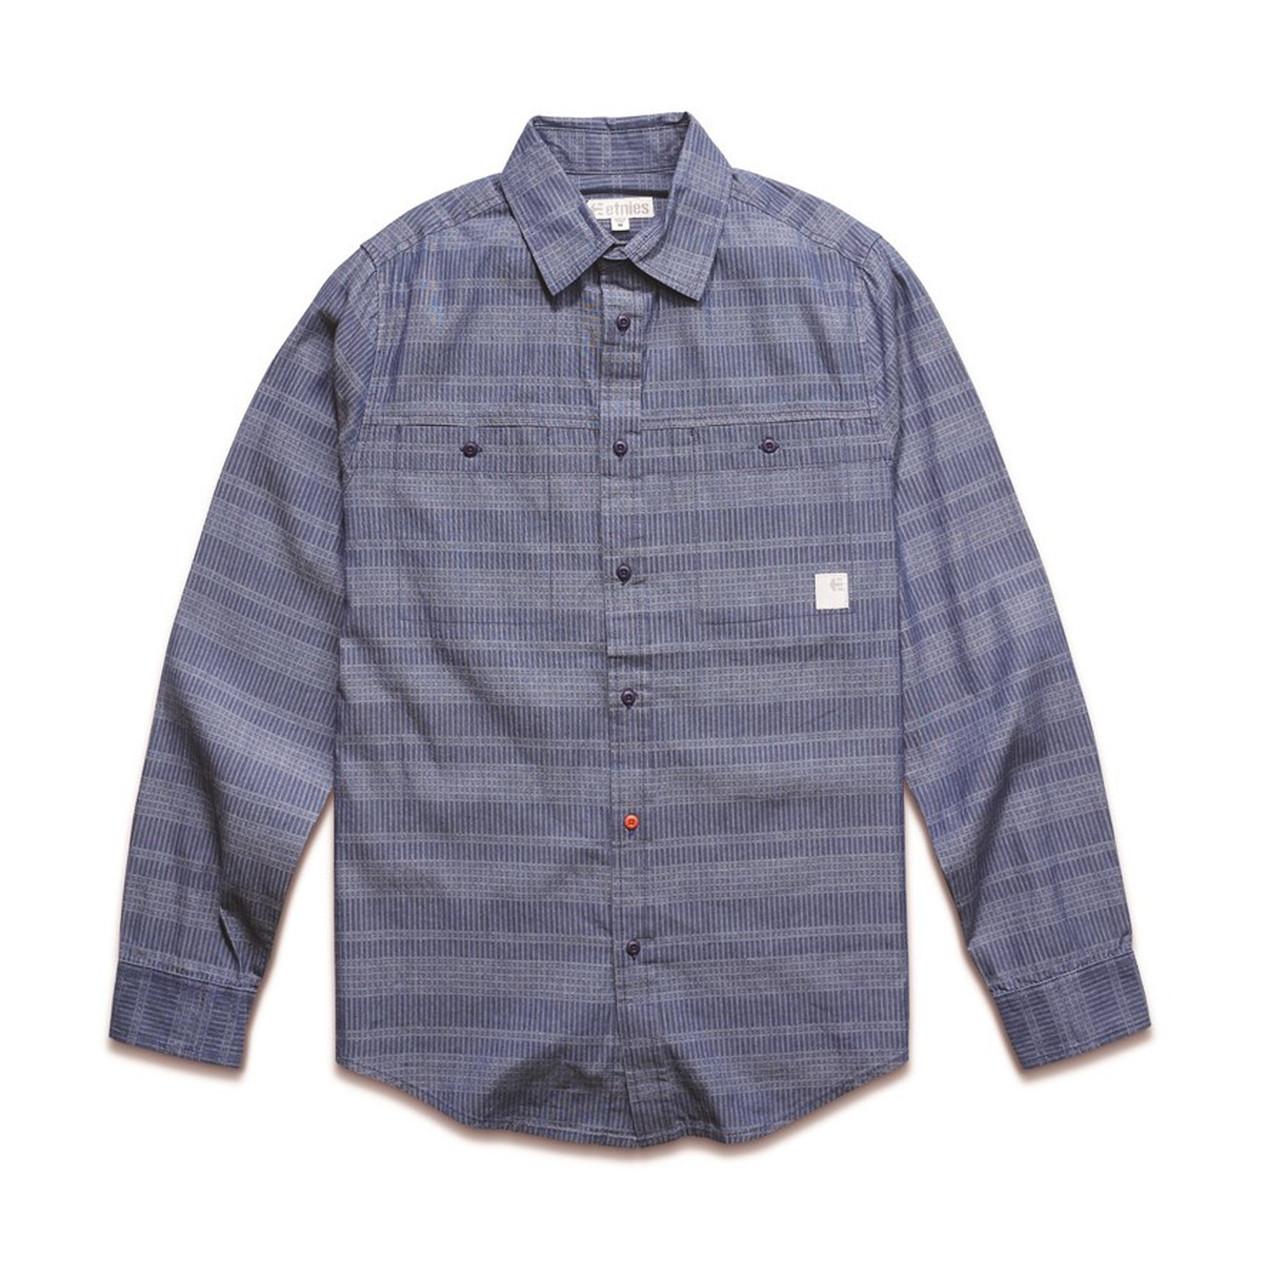 Etnies Button Down Shirt ZENT DARK NAVY